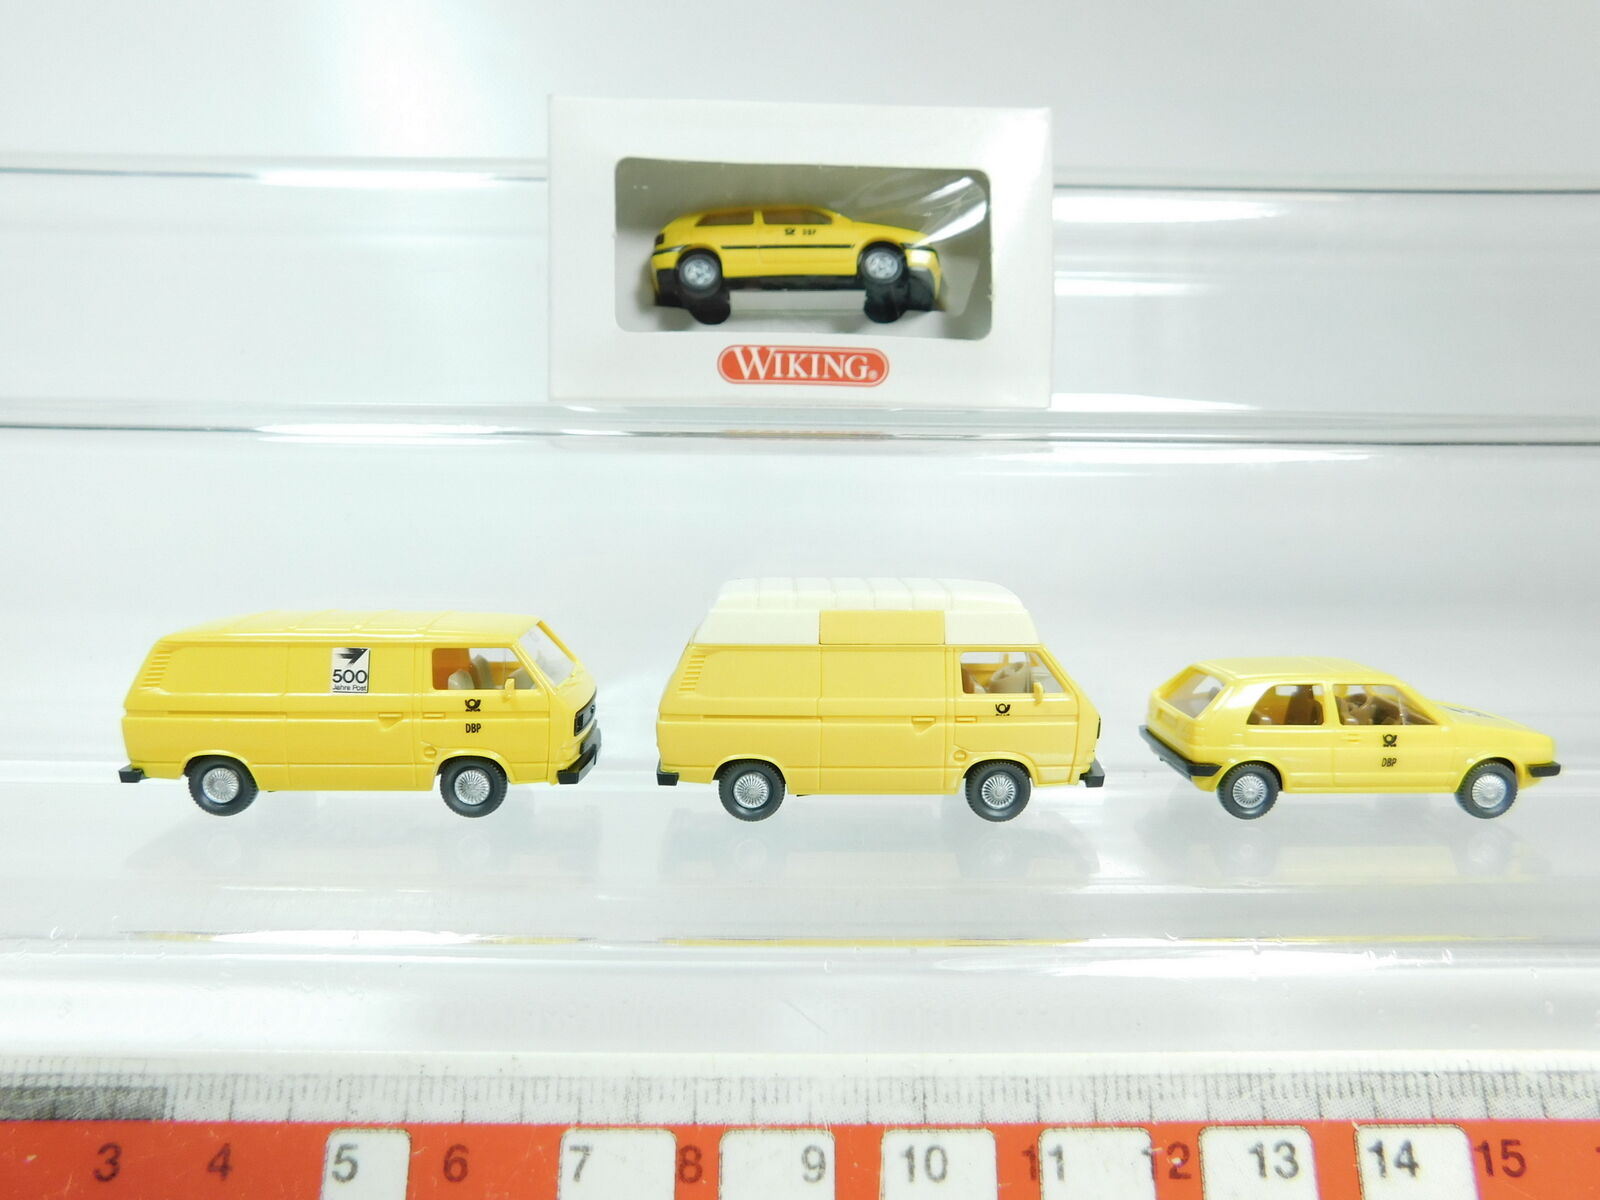 BH81-0,5 x wiking H0   1 87 post Model Volkswagen   VW  049 etc. ,Mint + 1x